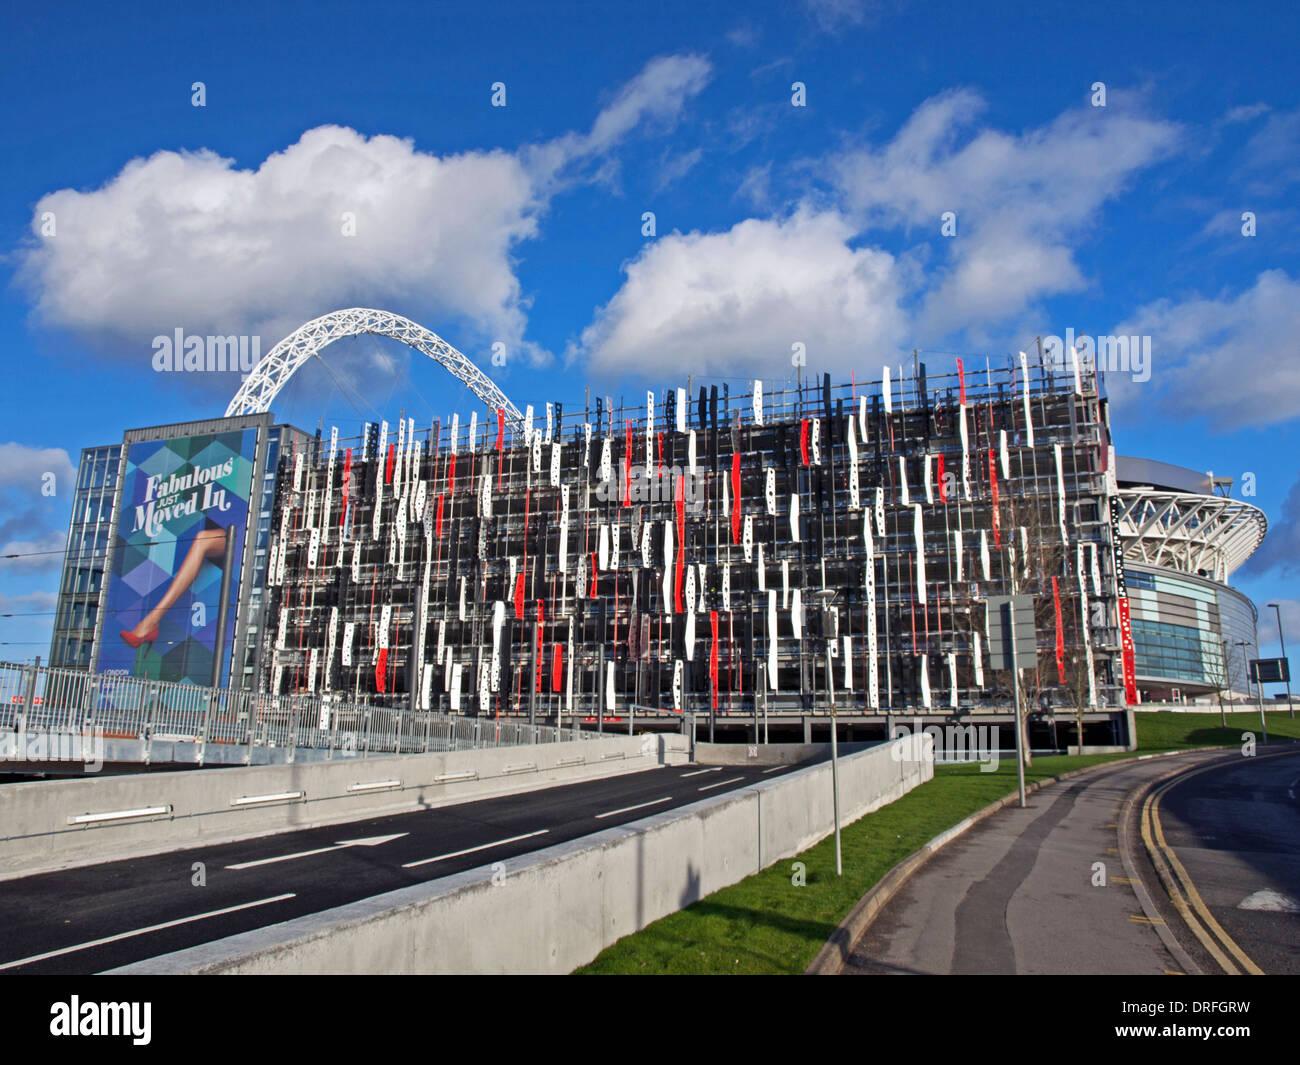 View of Wembley Stadium showing the London Designer Outlet car park, London Borough of Brent, London, England, UK - Stock Image